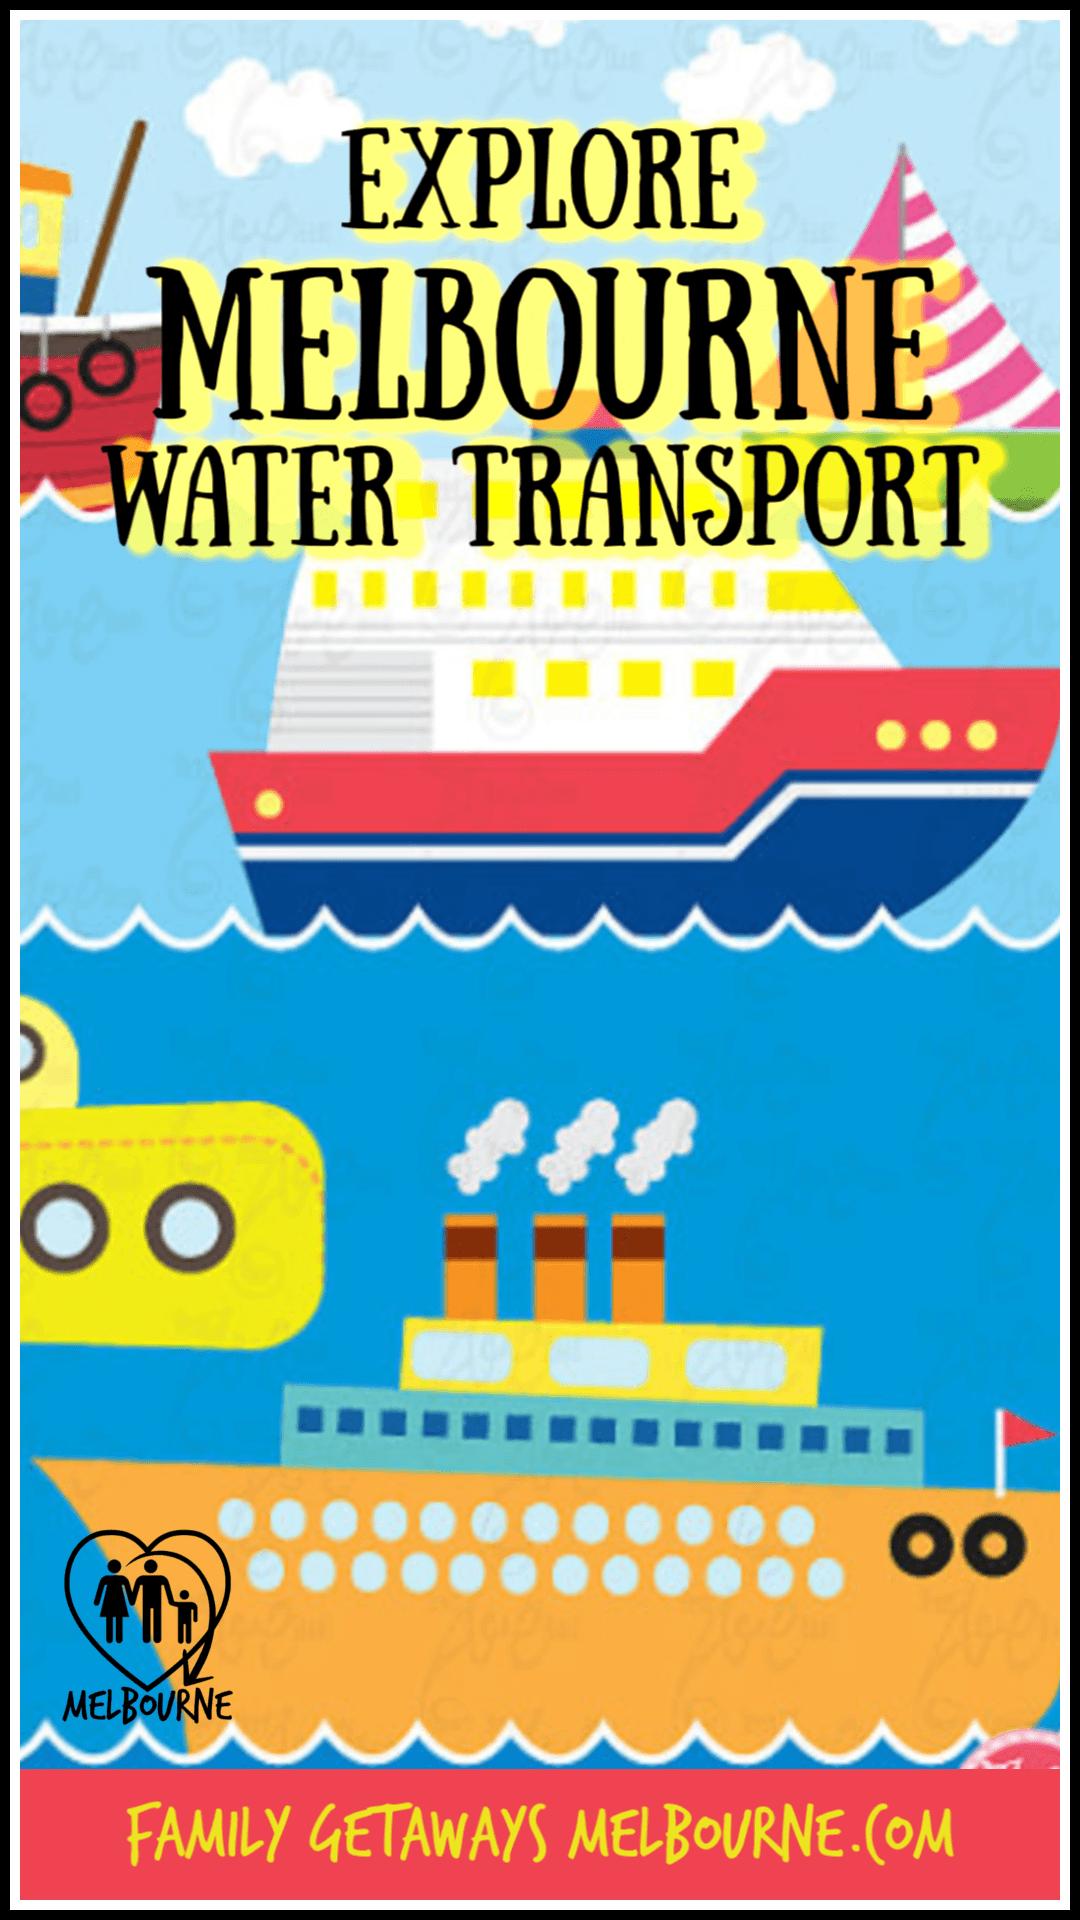 Information on water transport in Melbourne